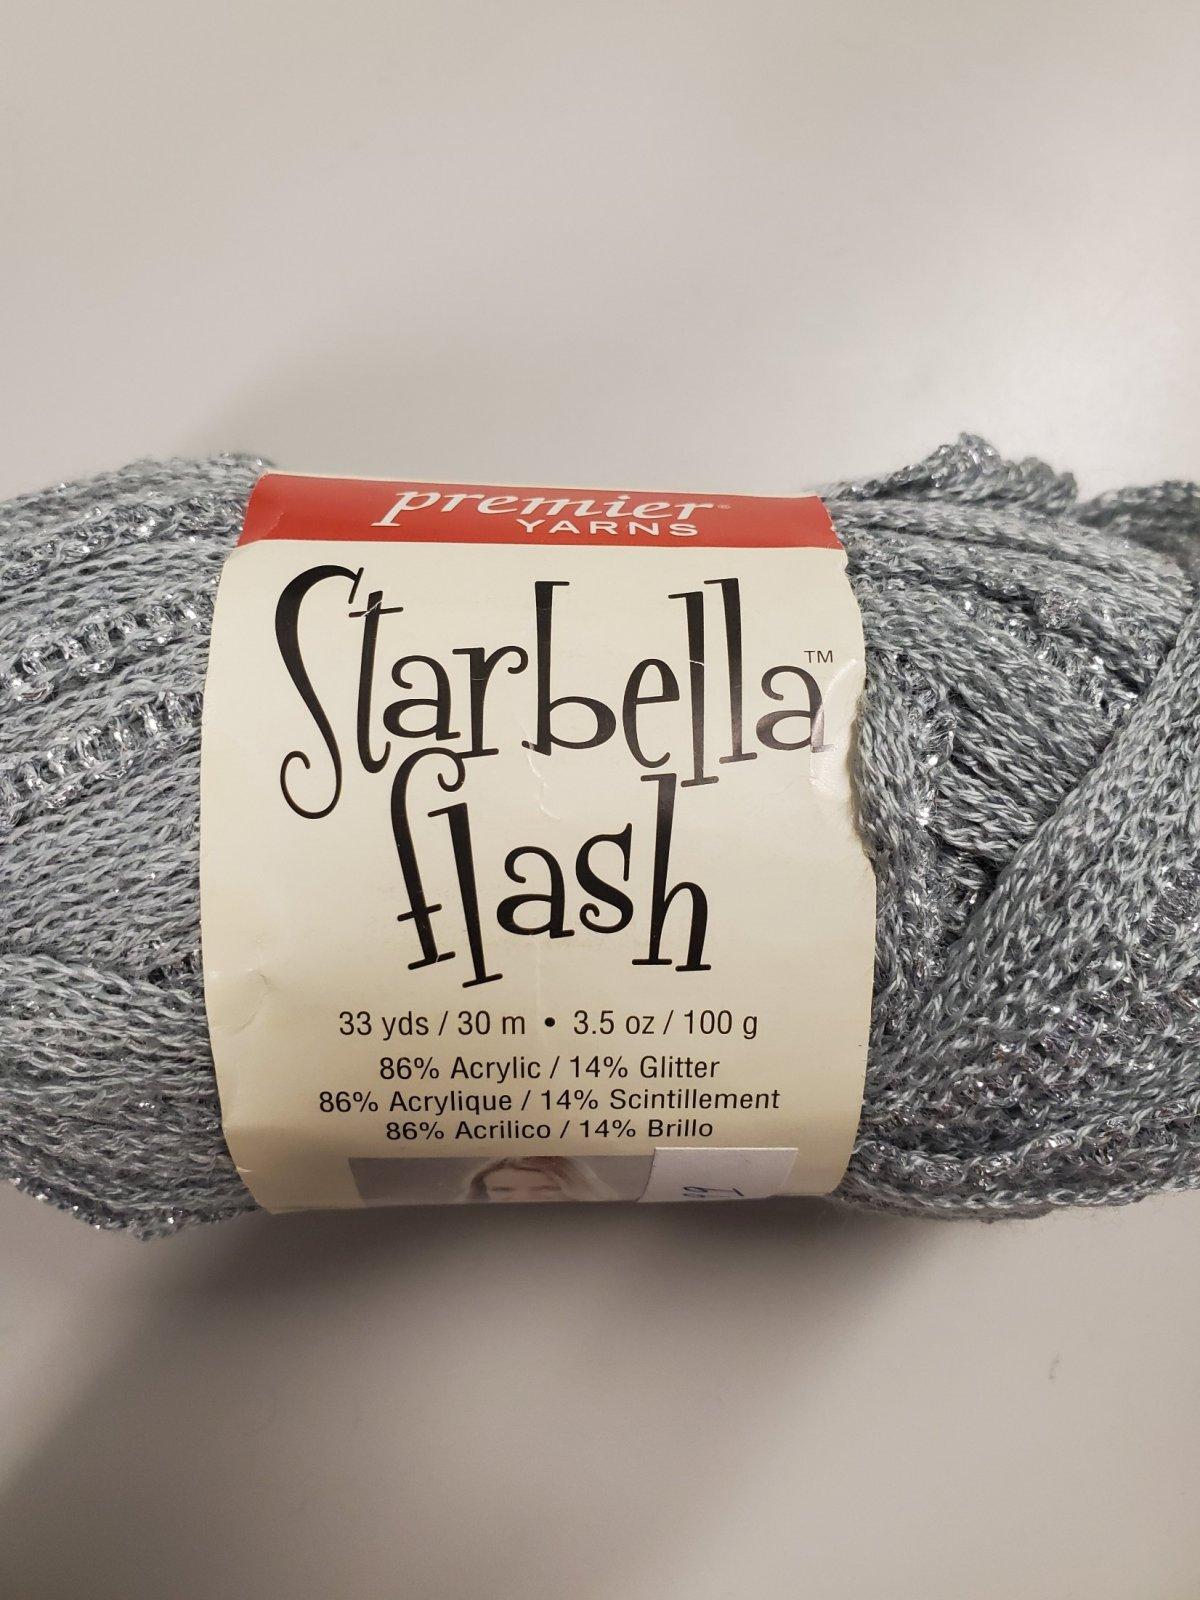 starbella flash